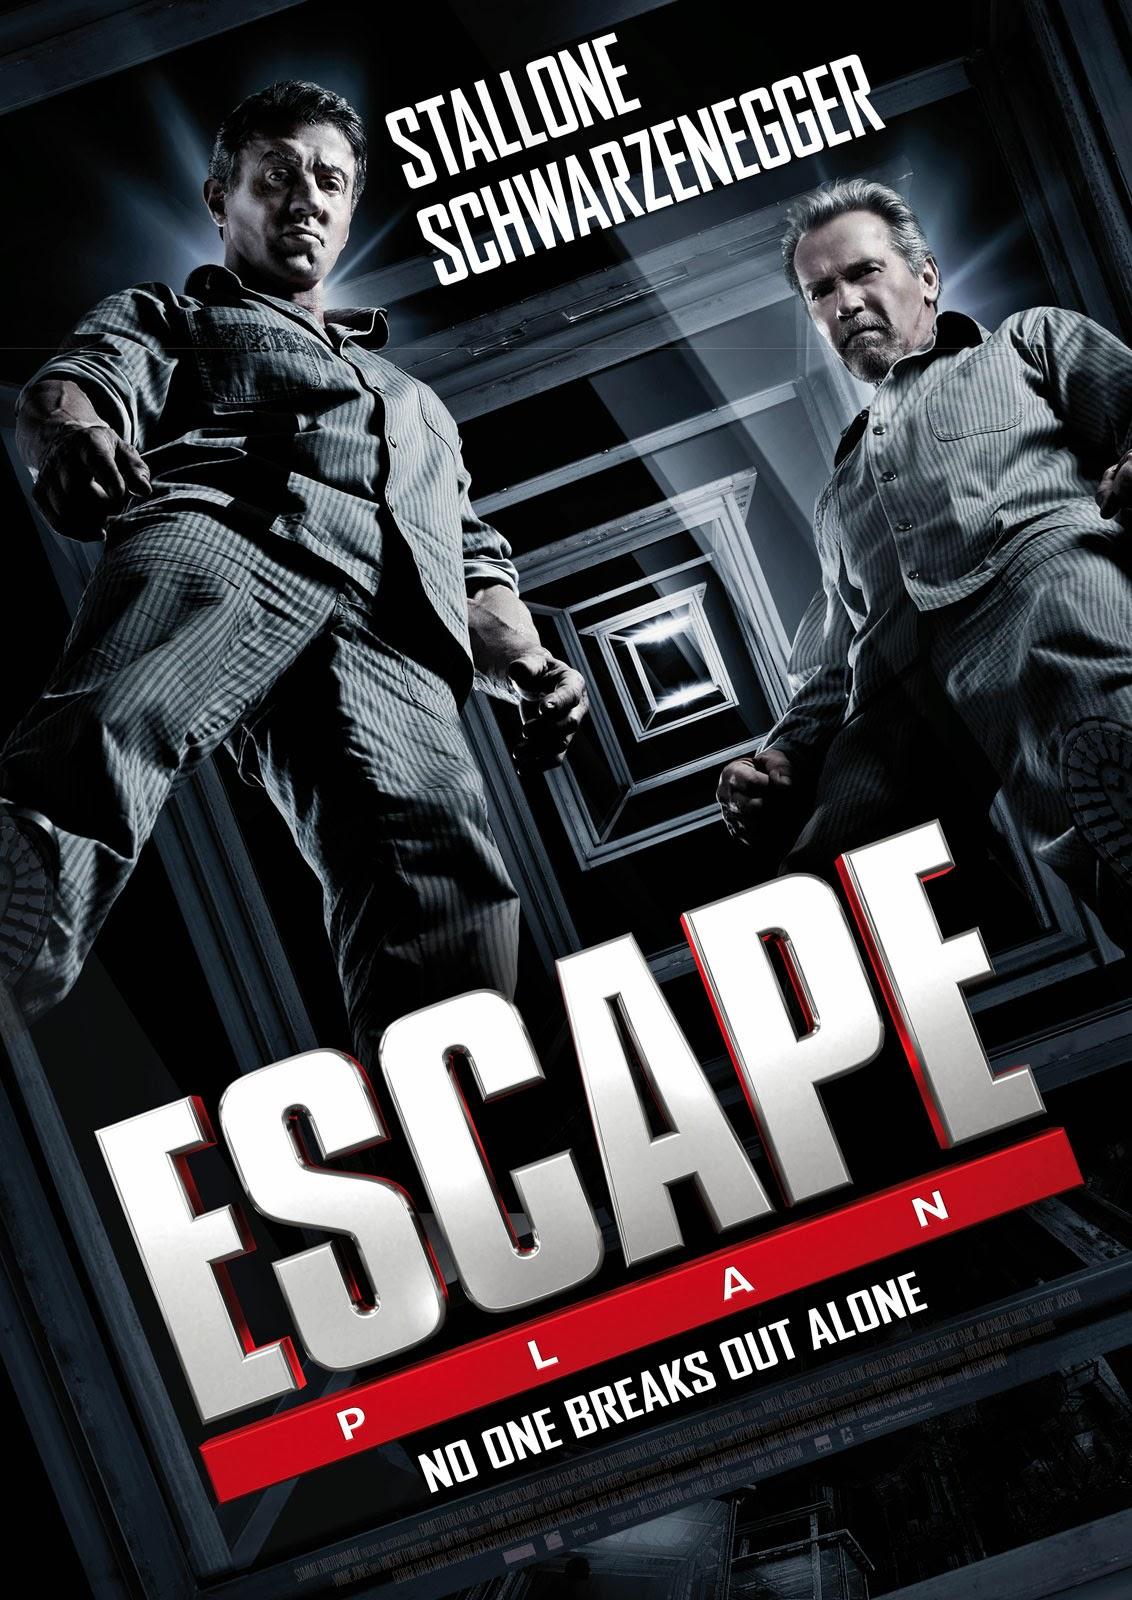 ESCAPE PLAN Tops Rentrak's Digital Movie Purchases & Rentals for Week Ending 2/9